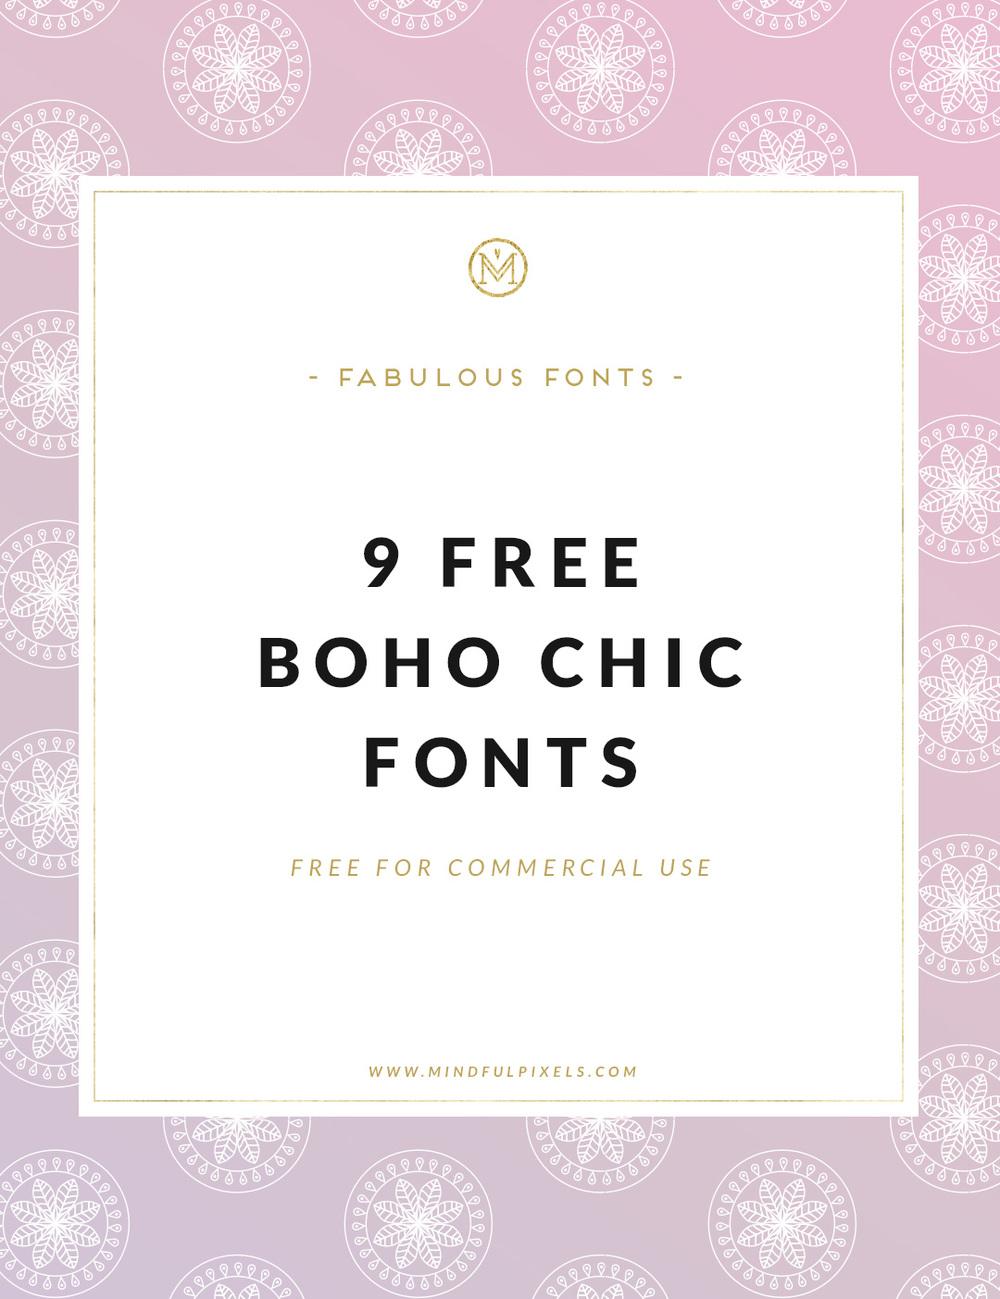 9 Free Boho Chic Fonts